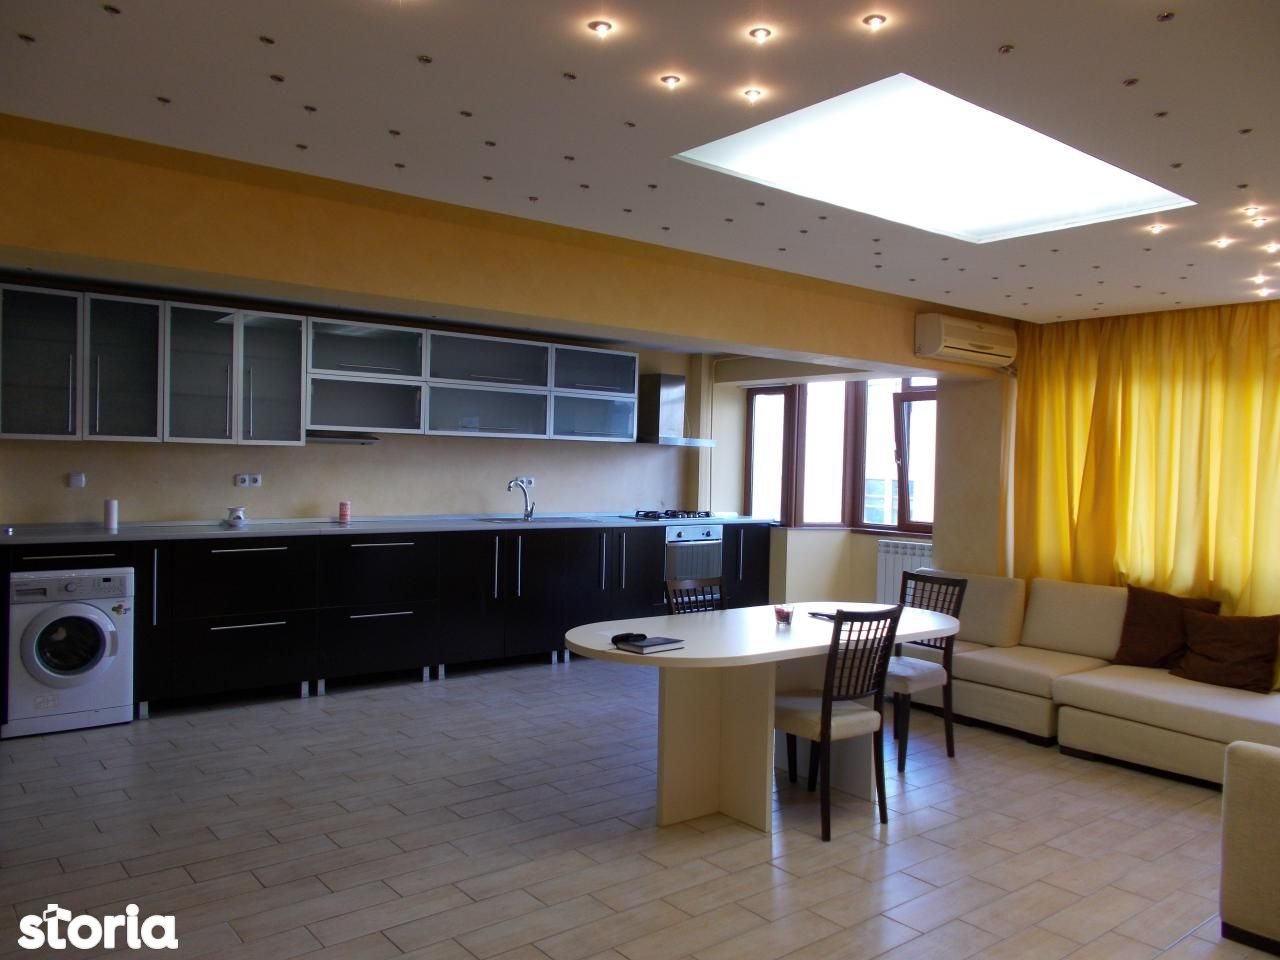 Apartament de vanzare, Brăila (judet), Cãlãrași 4 - Foto 1